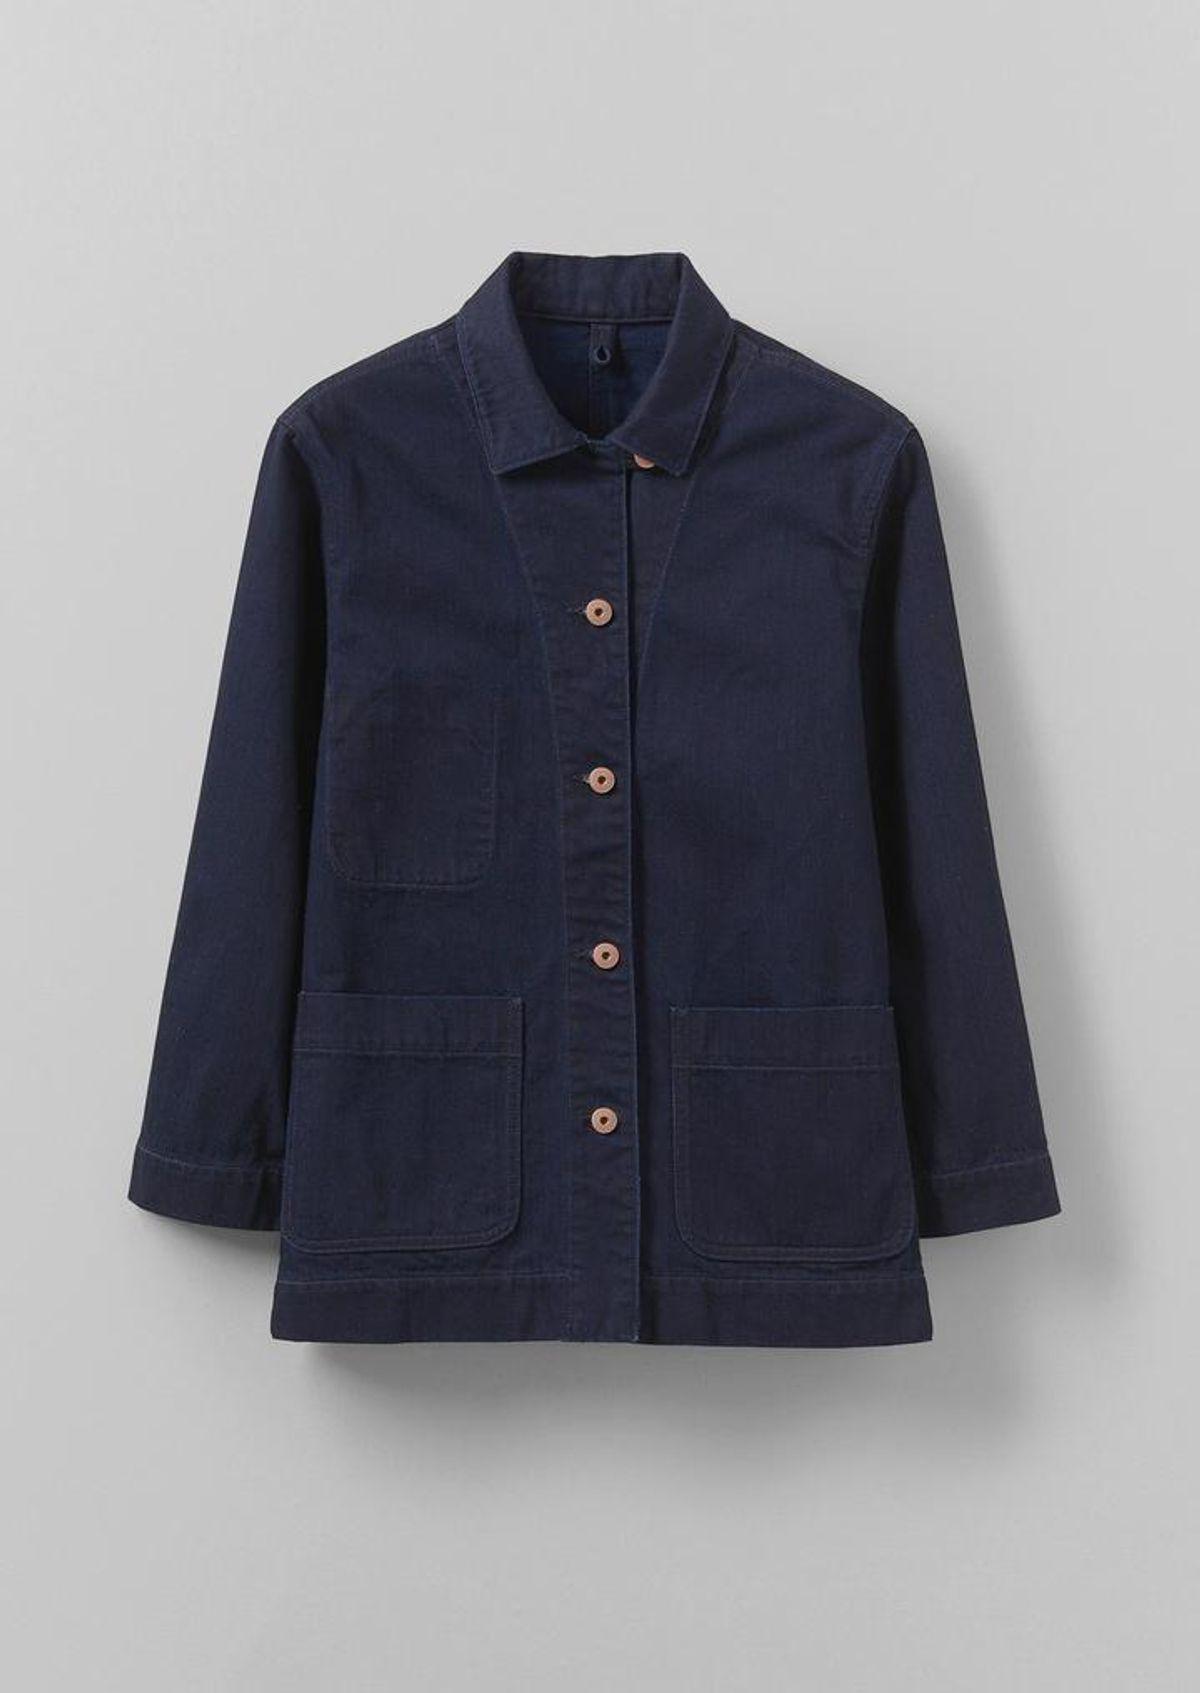 Blackhorse Lane Denim Jacket